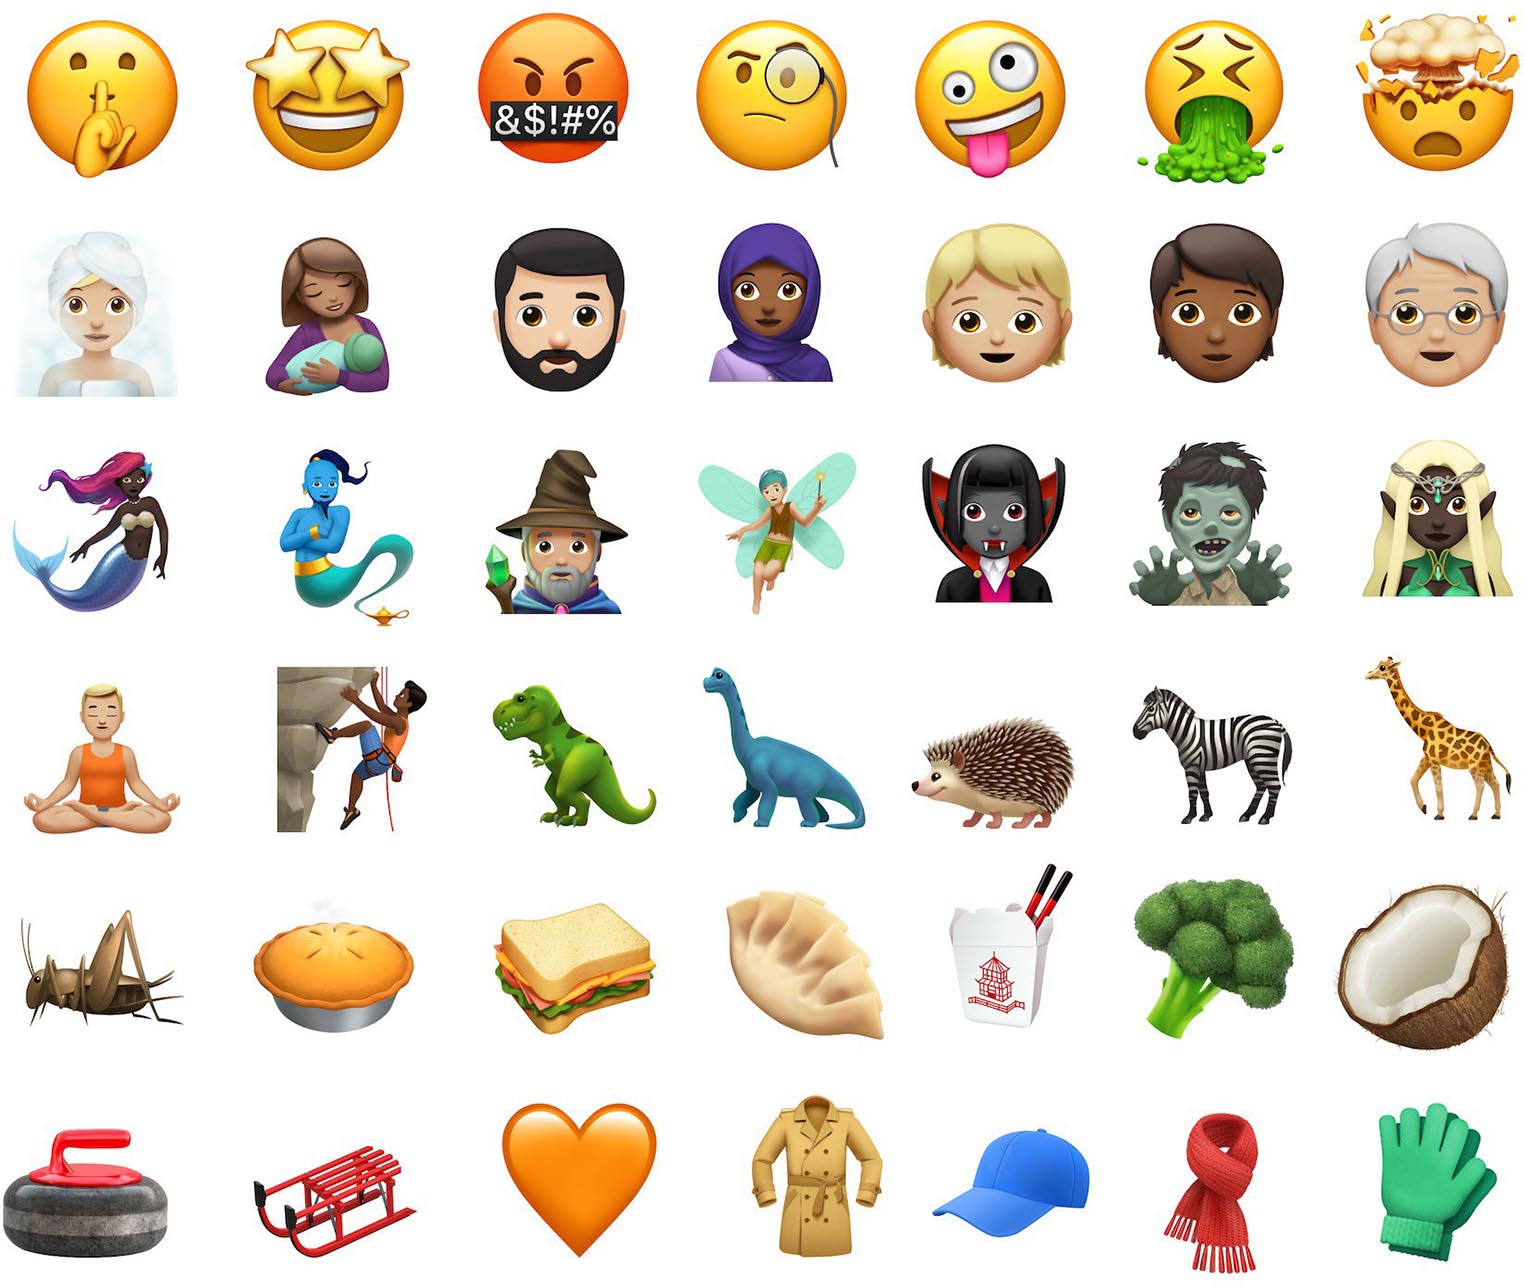 iOS 11.1 emojis